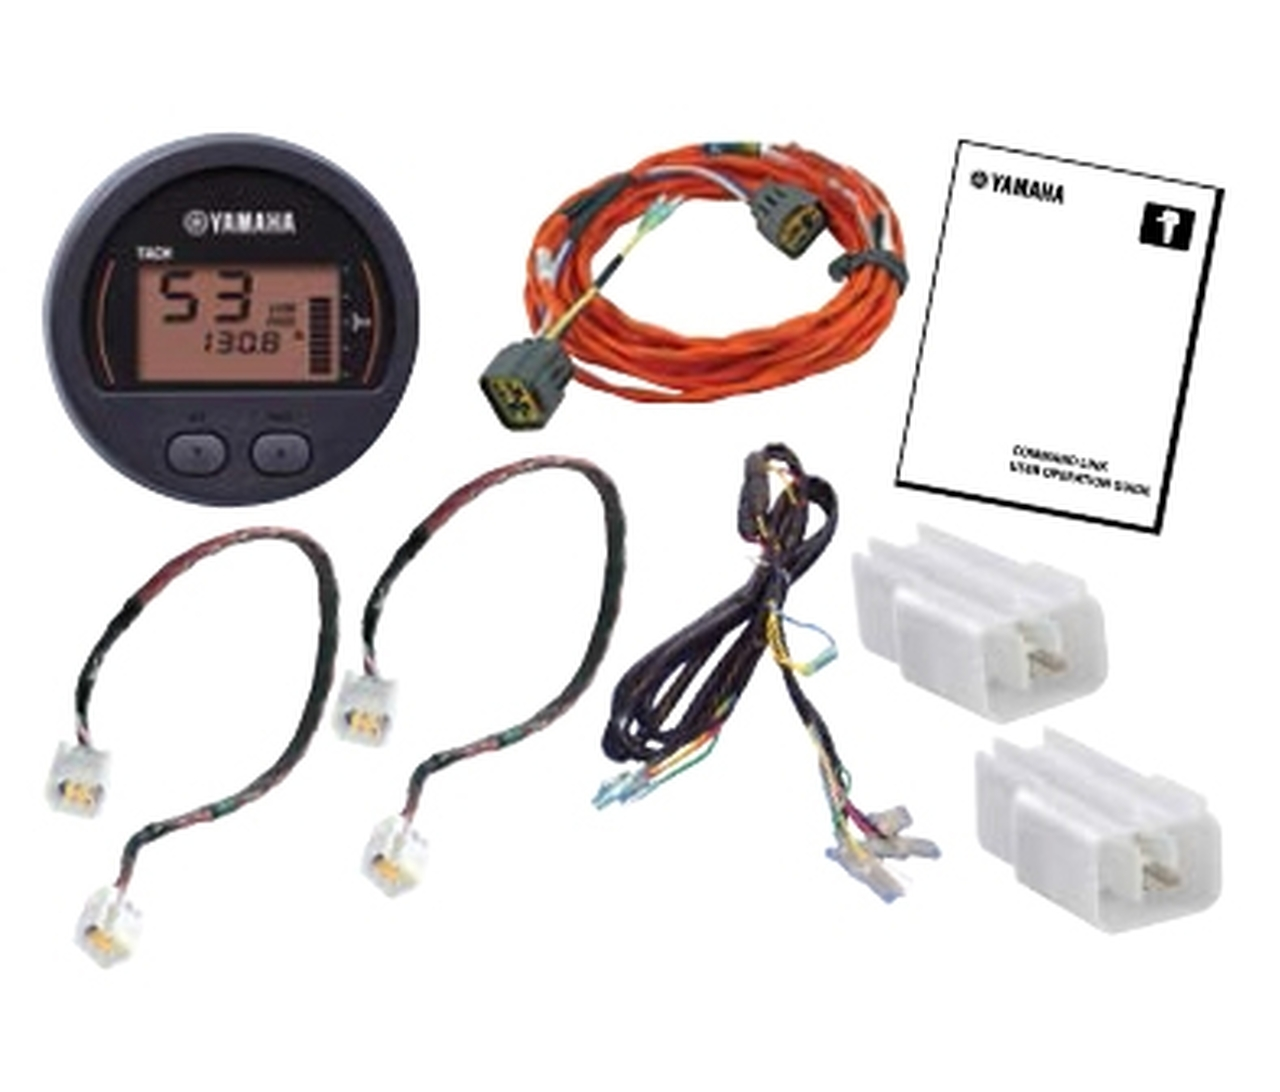 Yamaha outboard motor tachometer